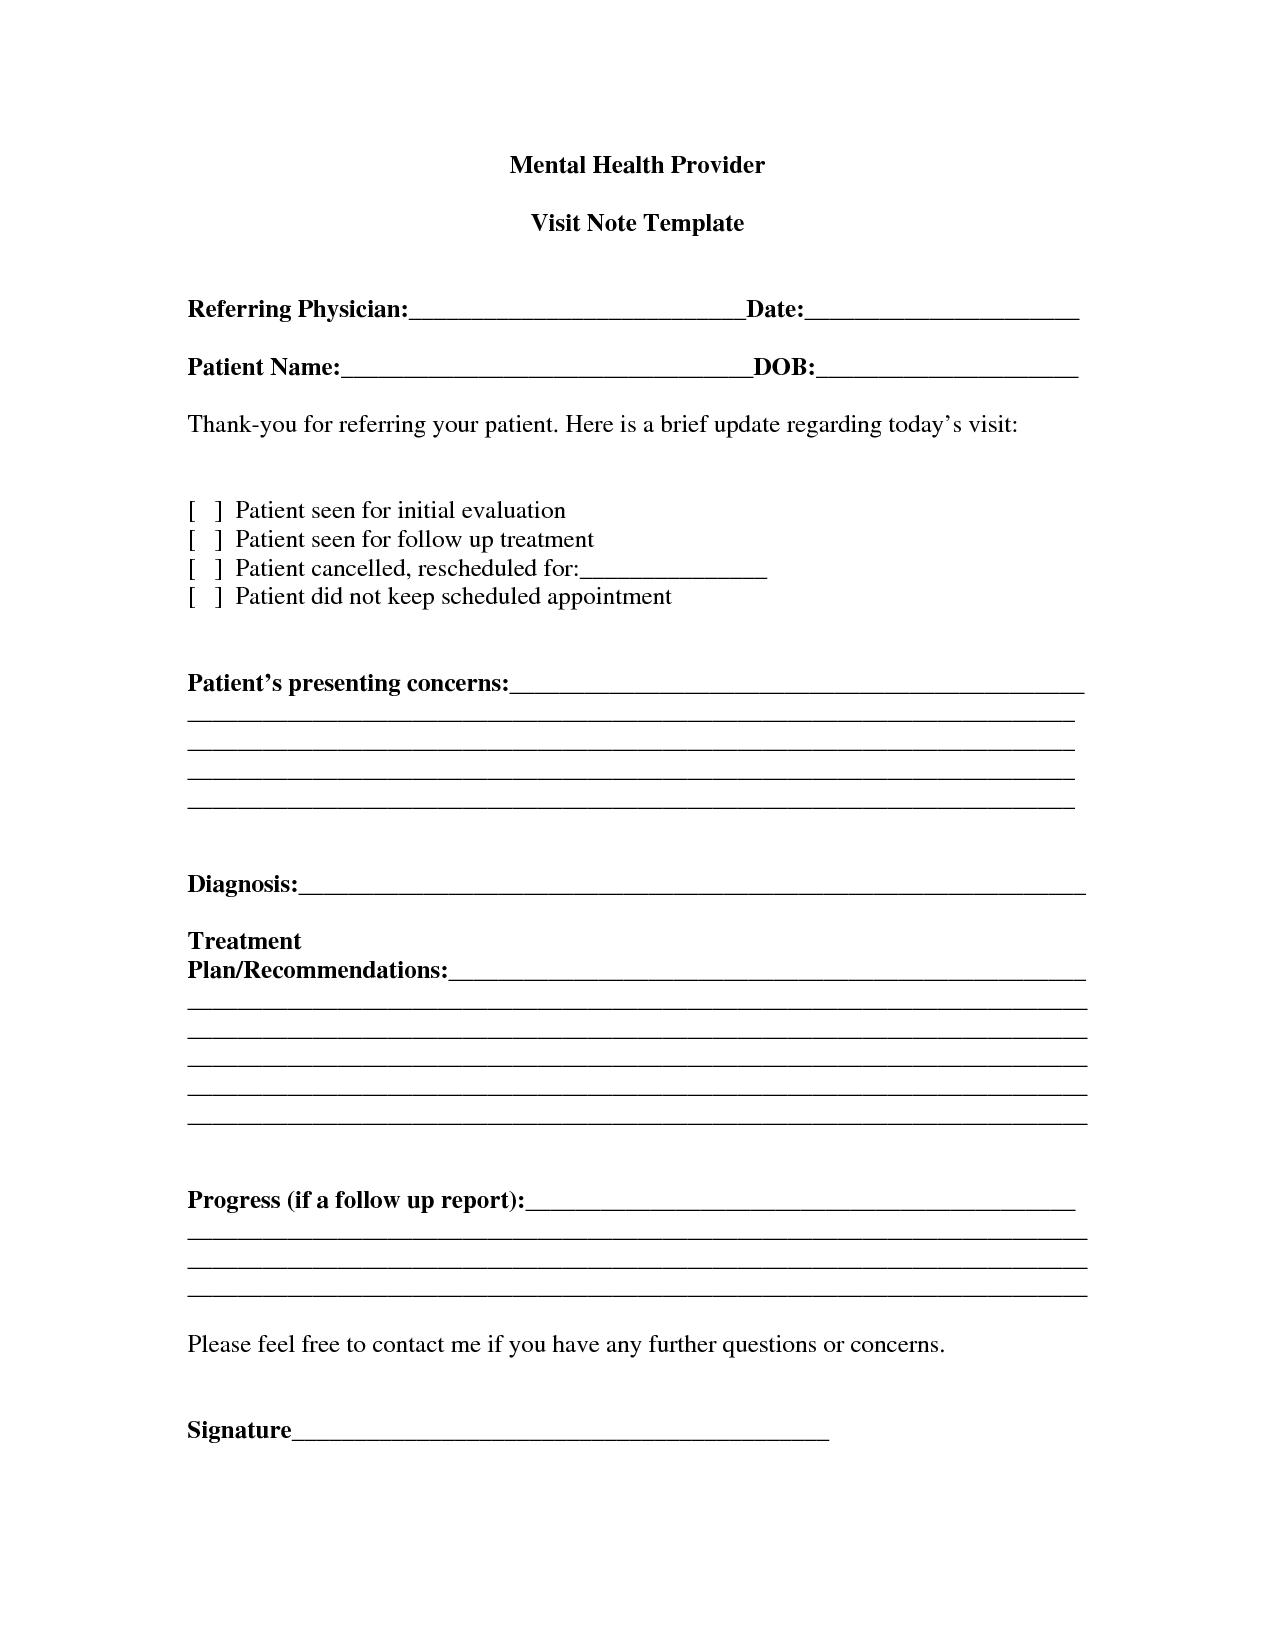 Mental health progress note sample